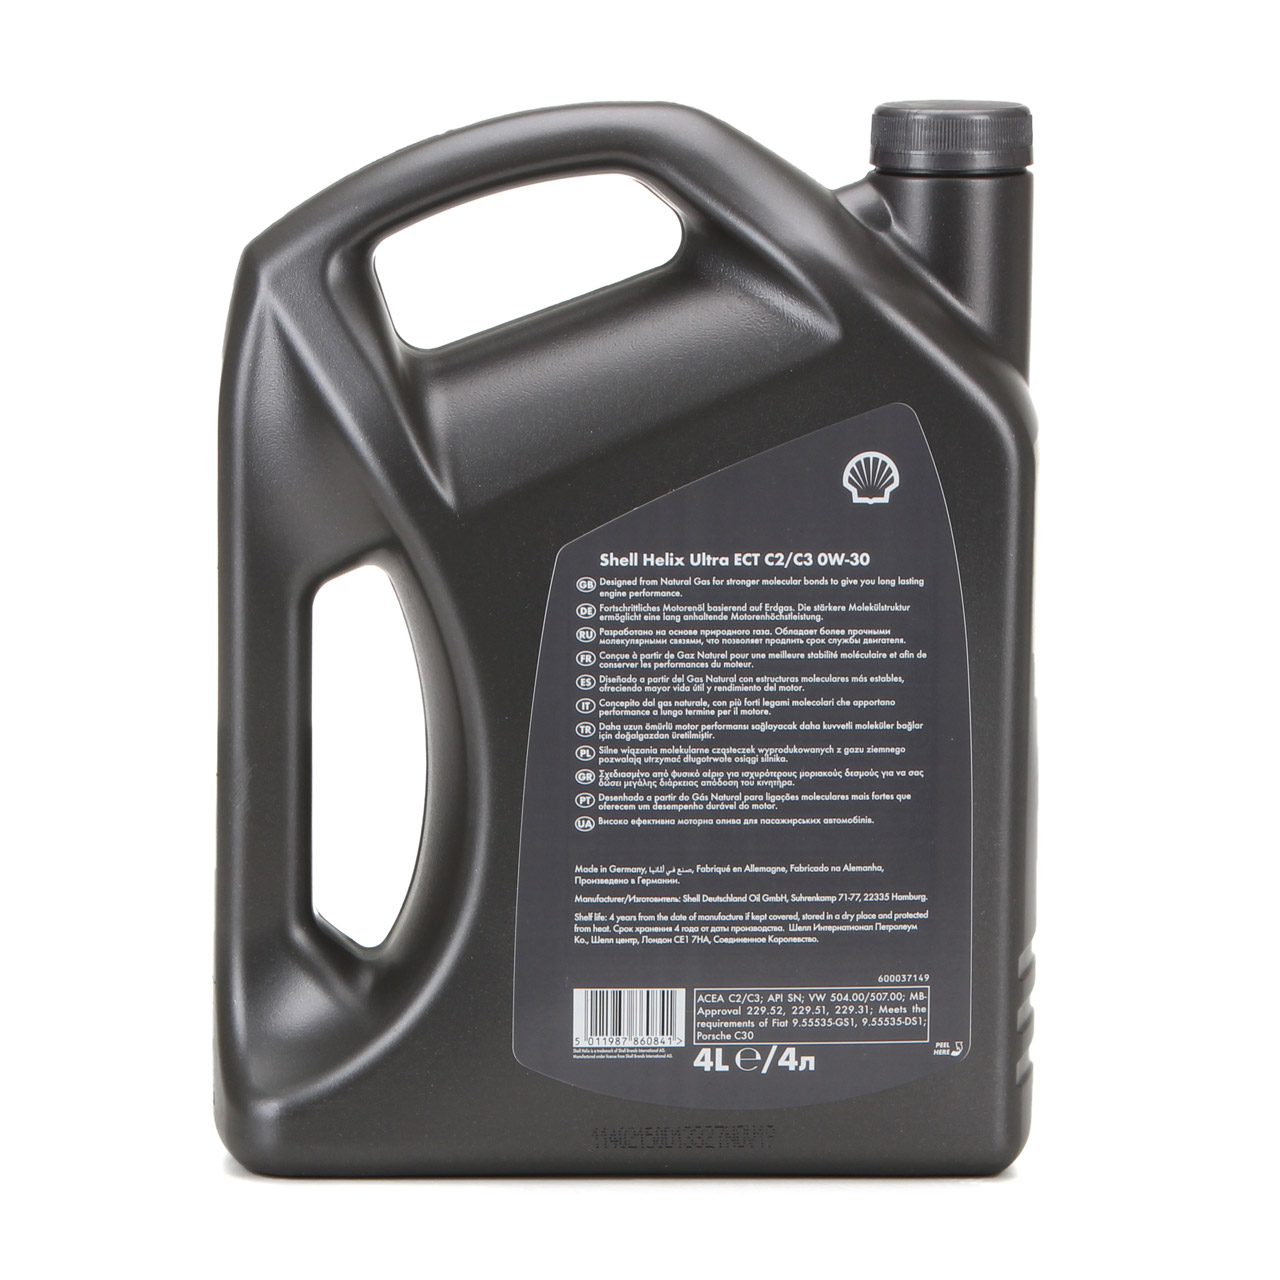 SHELL Motoröl Öl HELIX ULTRA ECT C2/C3 0W30 VW 50400/50700 MB 229.52 - 4 Liter